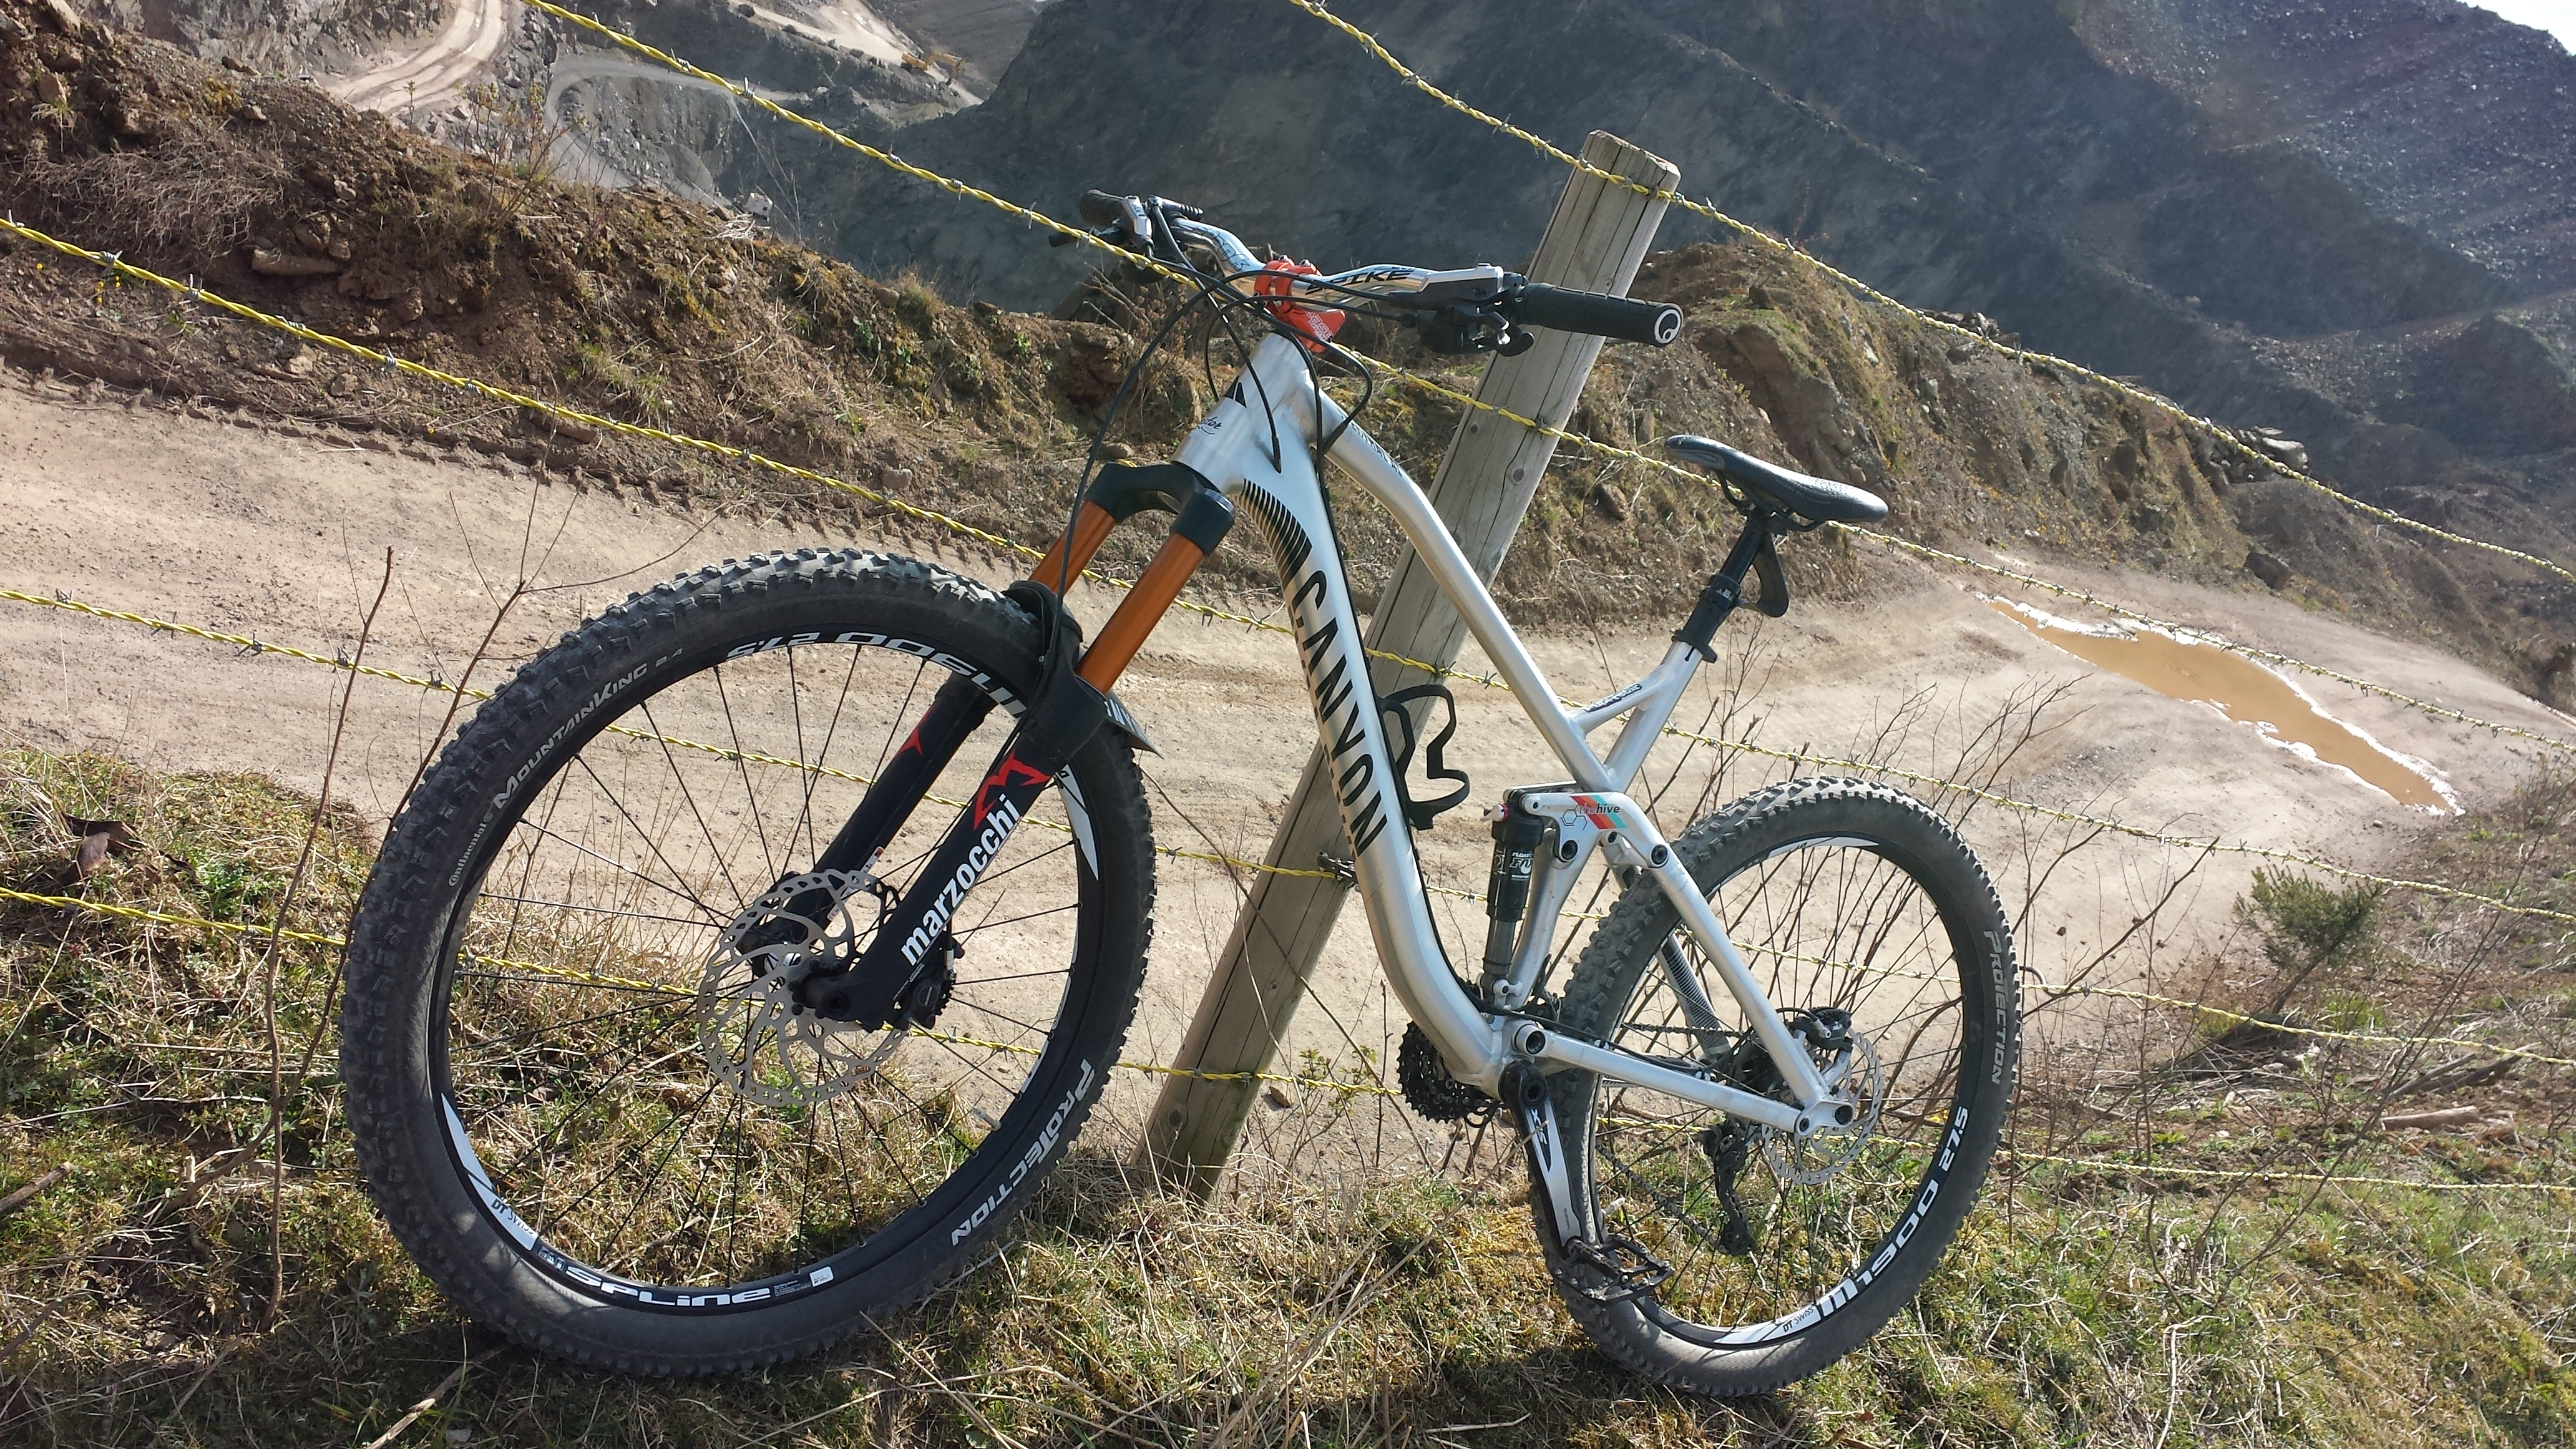 Canyon Spectral Al 2015 Raw Polished Trail Rocket